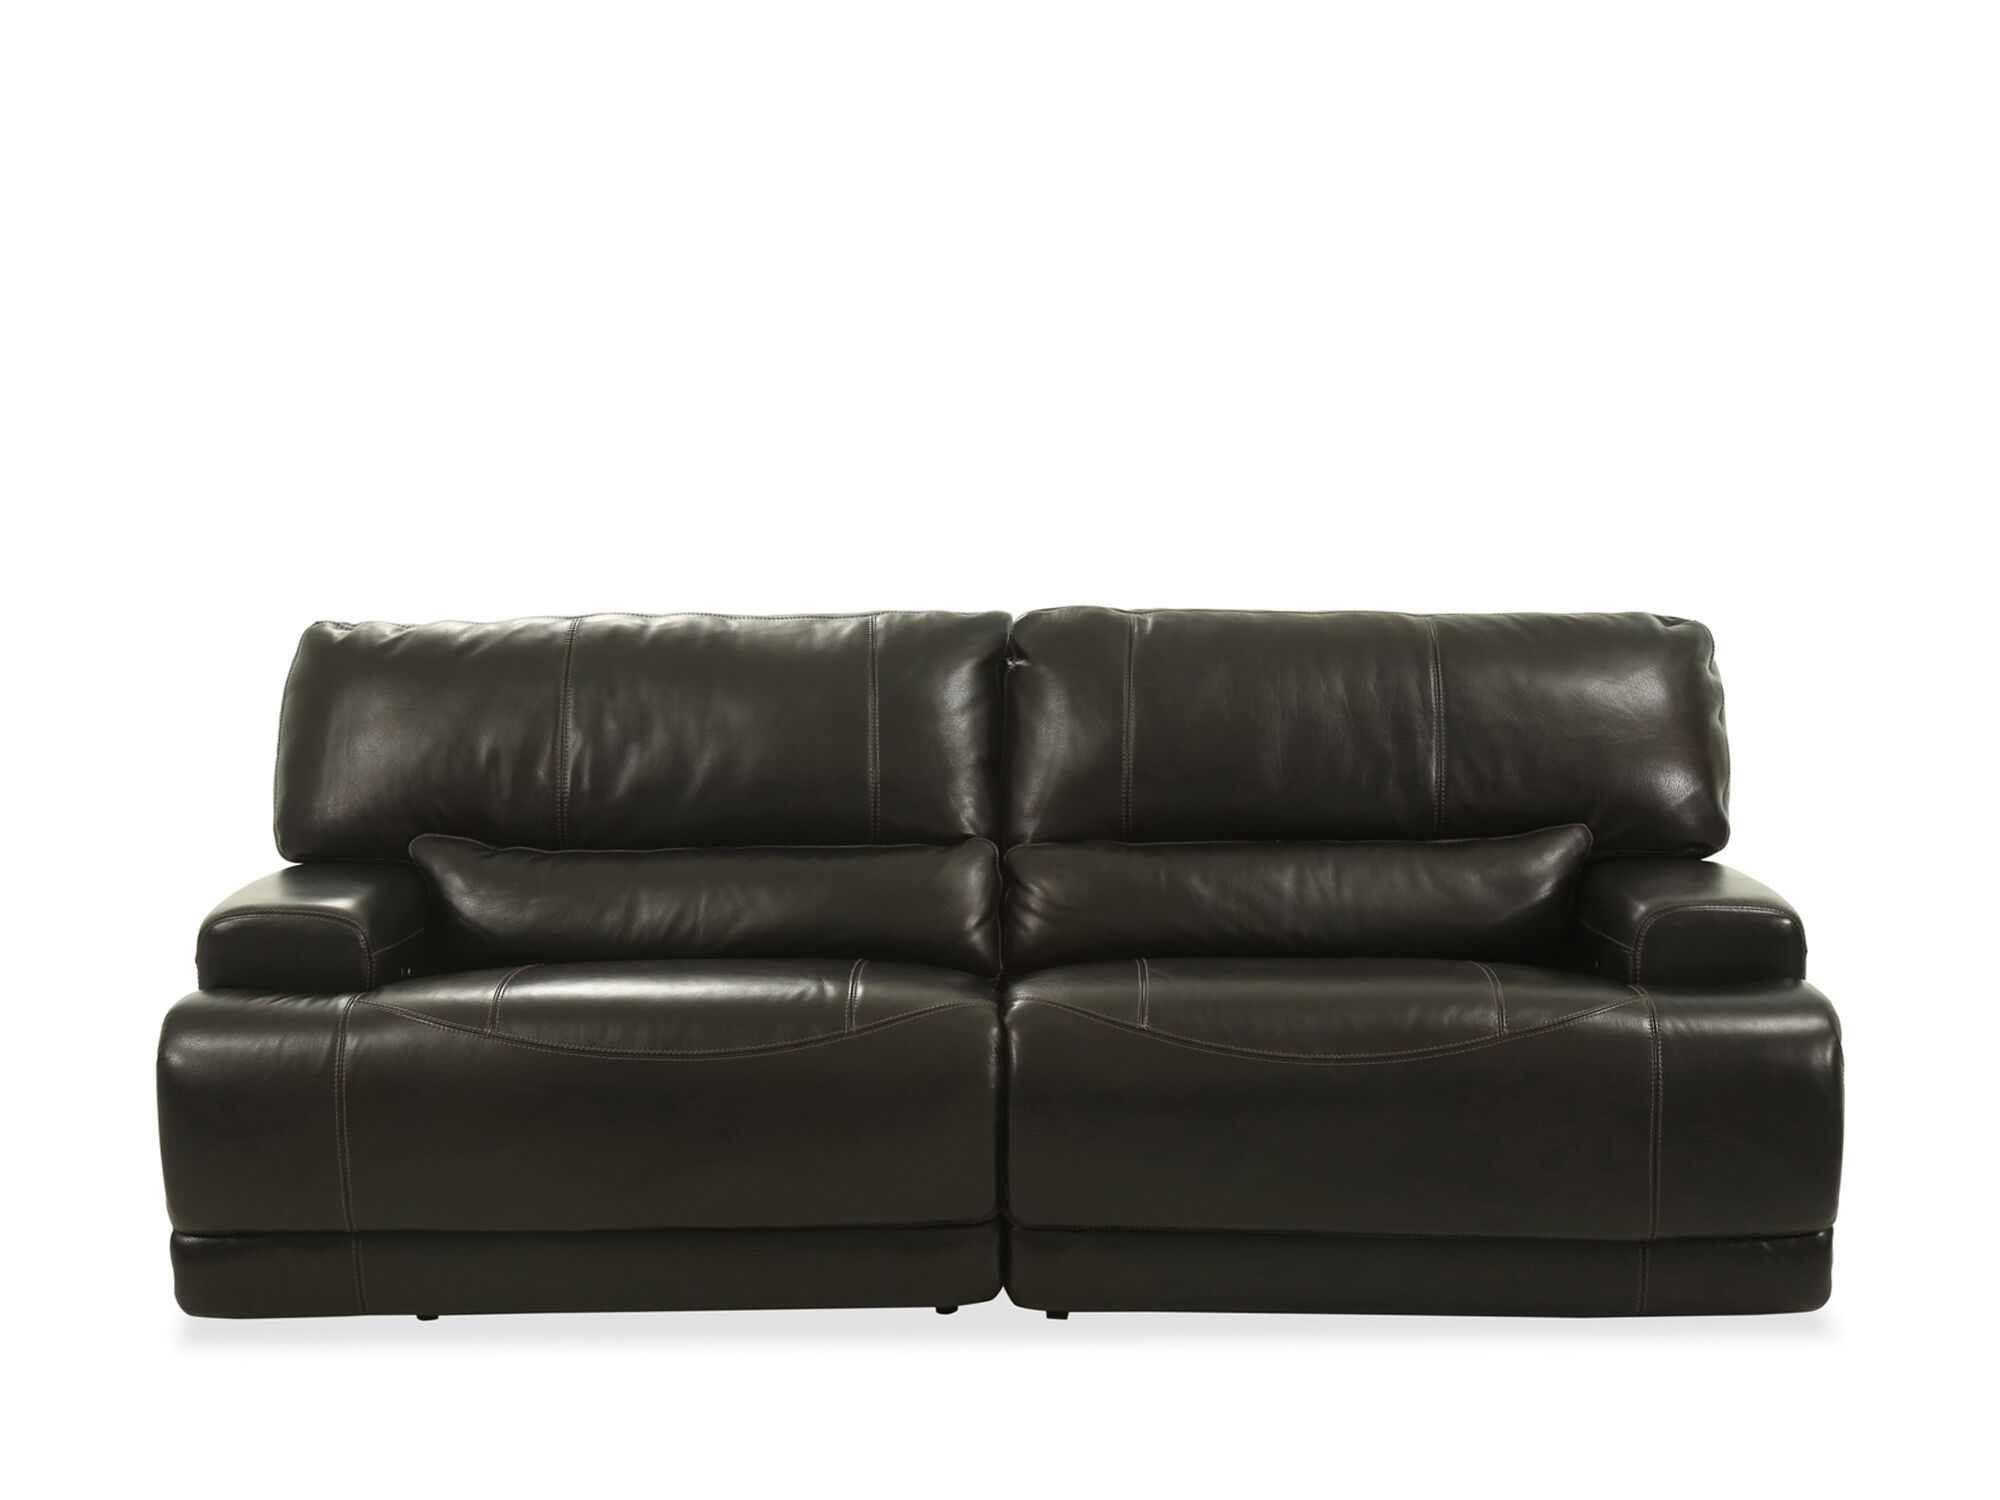 burgundy leather closeout sofa ekenasfiber johnhenriksson se u2022 rh ekenasfiber johnhenriksson se